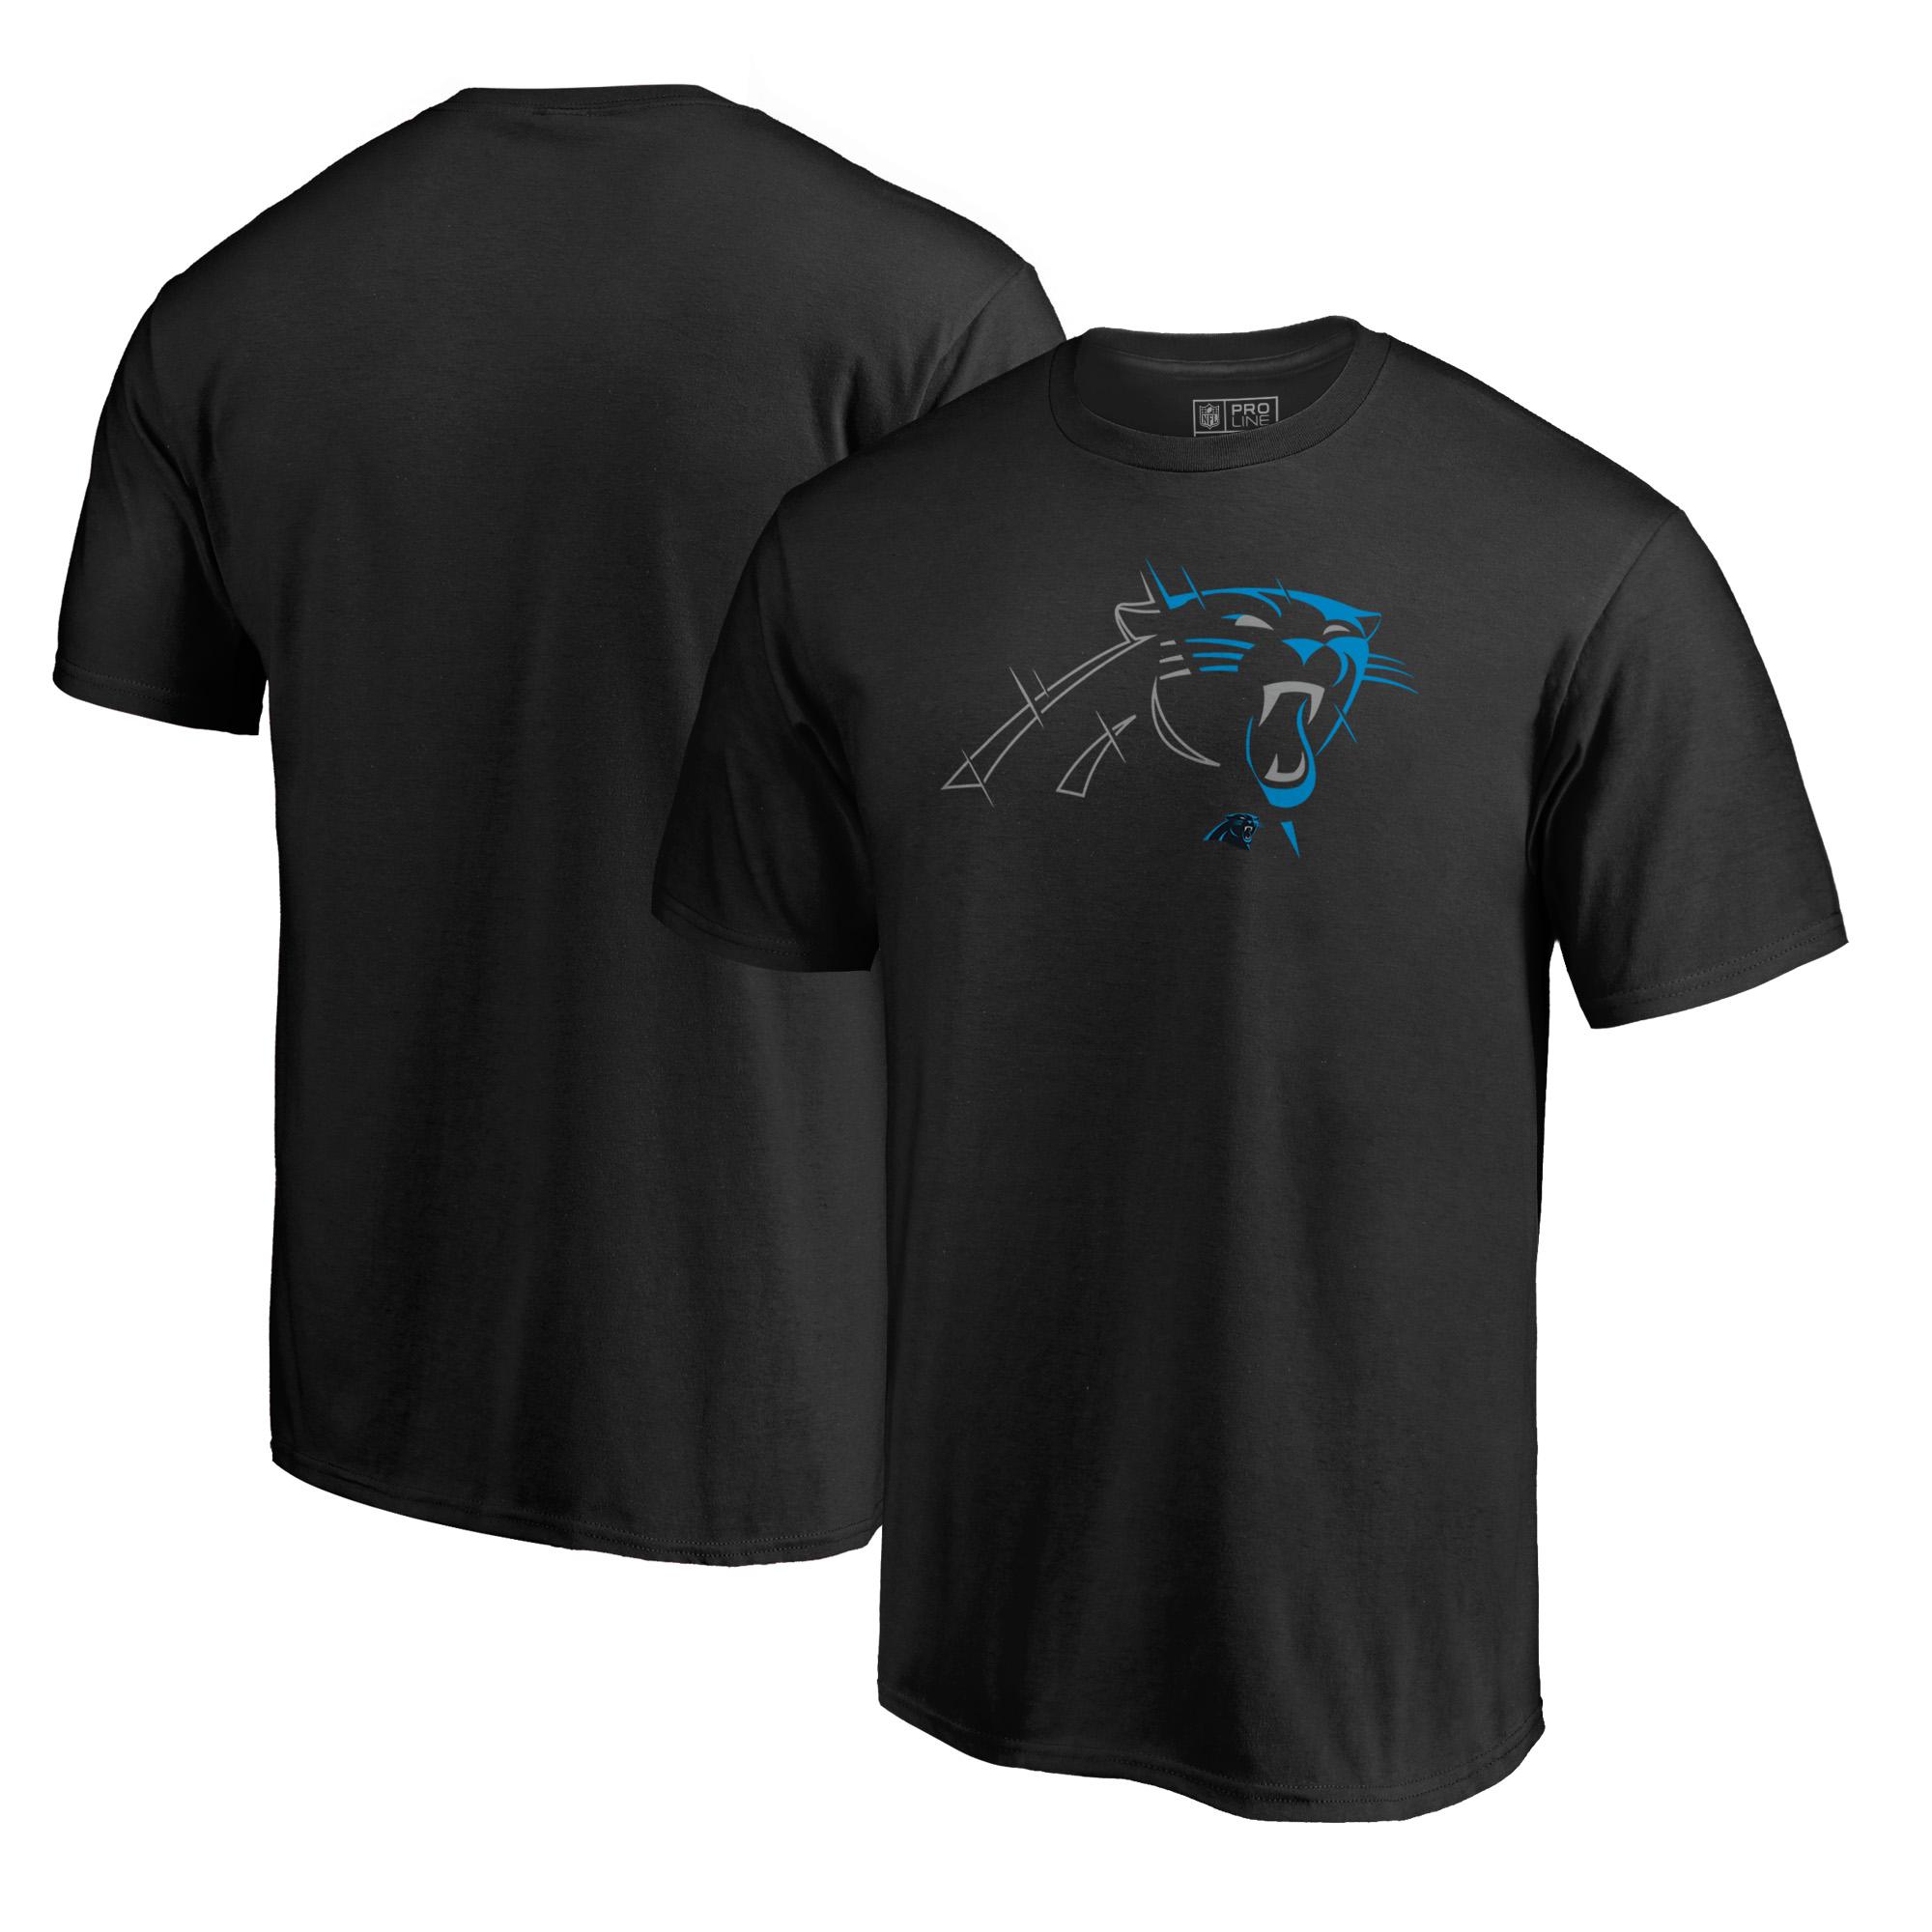 Carolina Panthers NFL Pro Line by Fanatics Branded X-Ray T-Shirt - Black